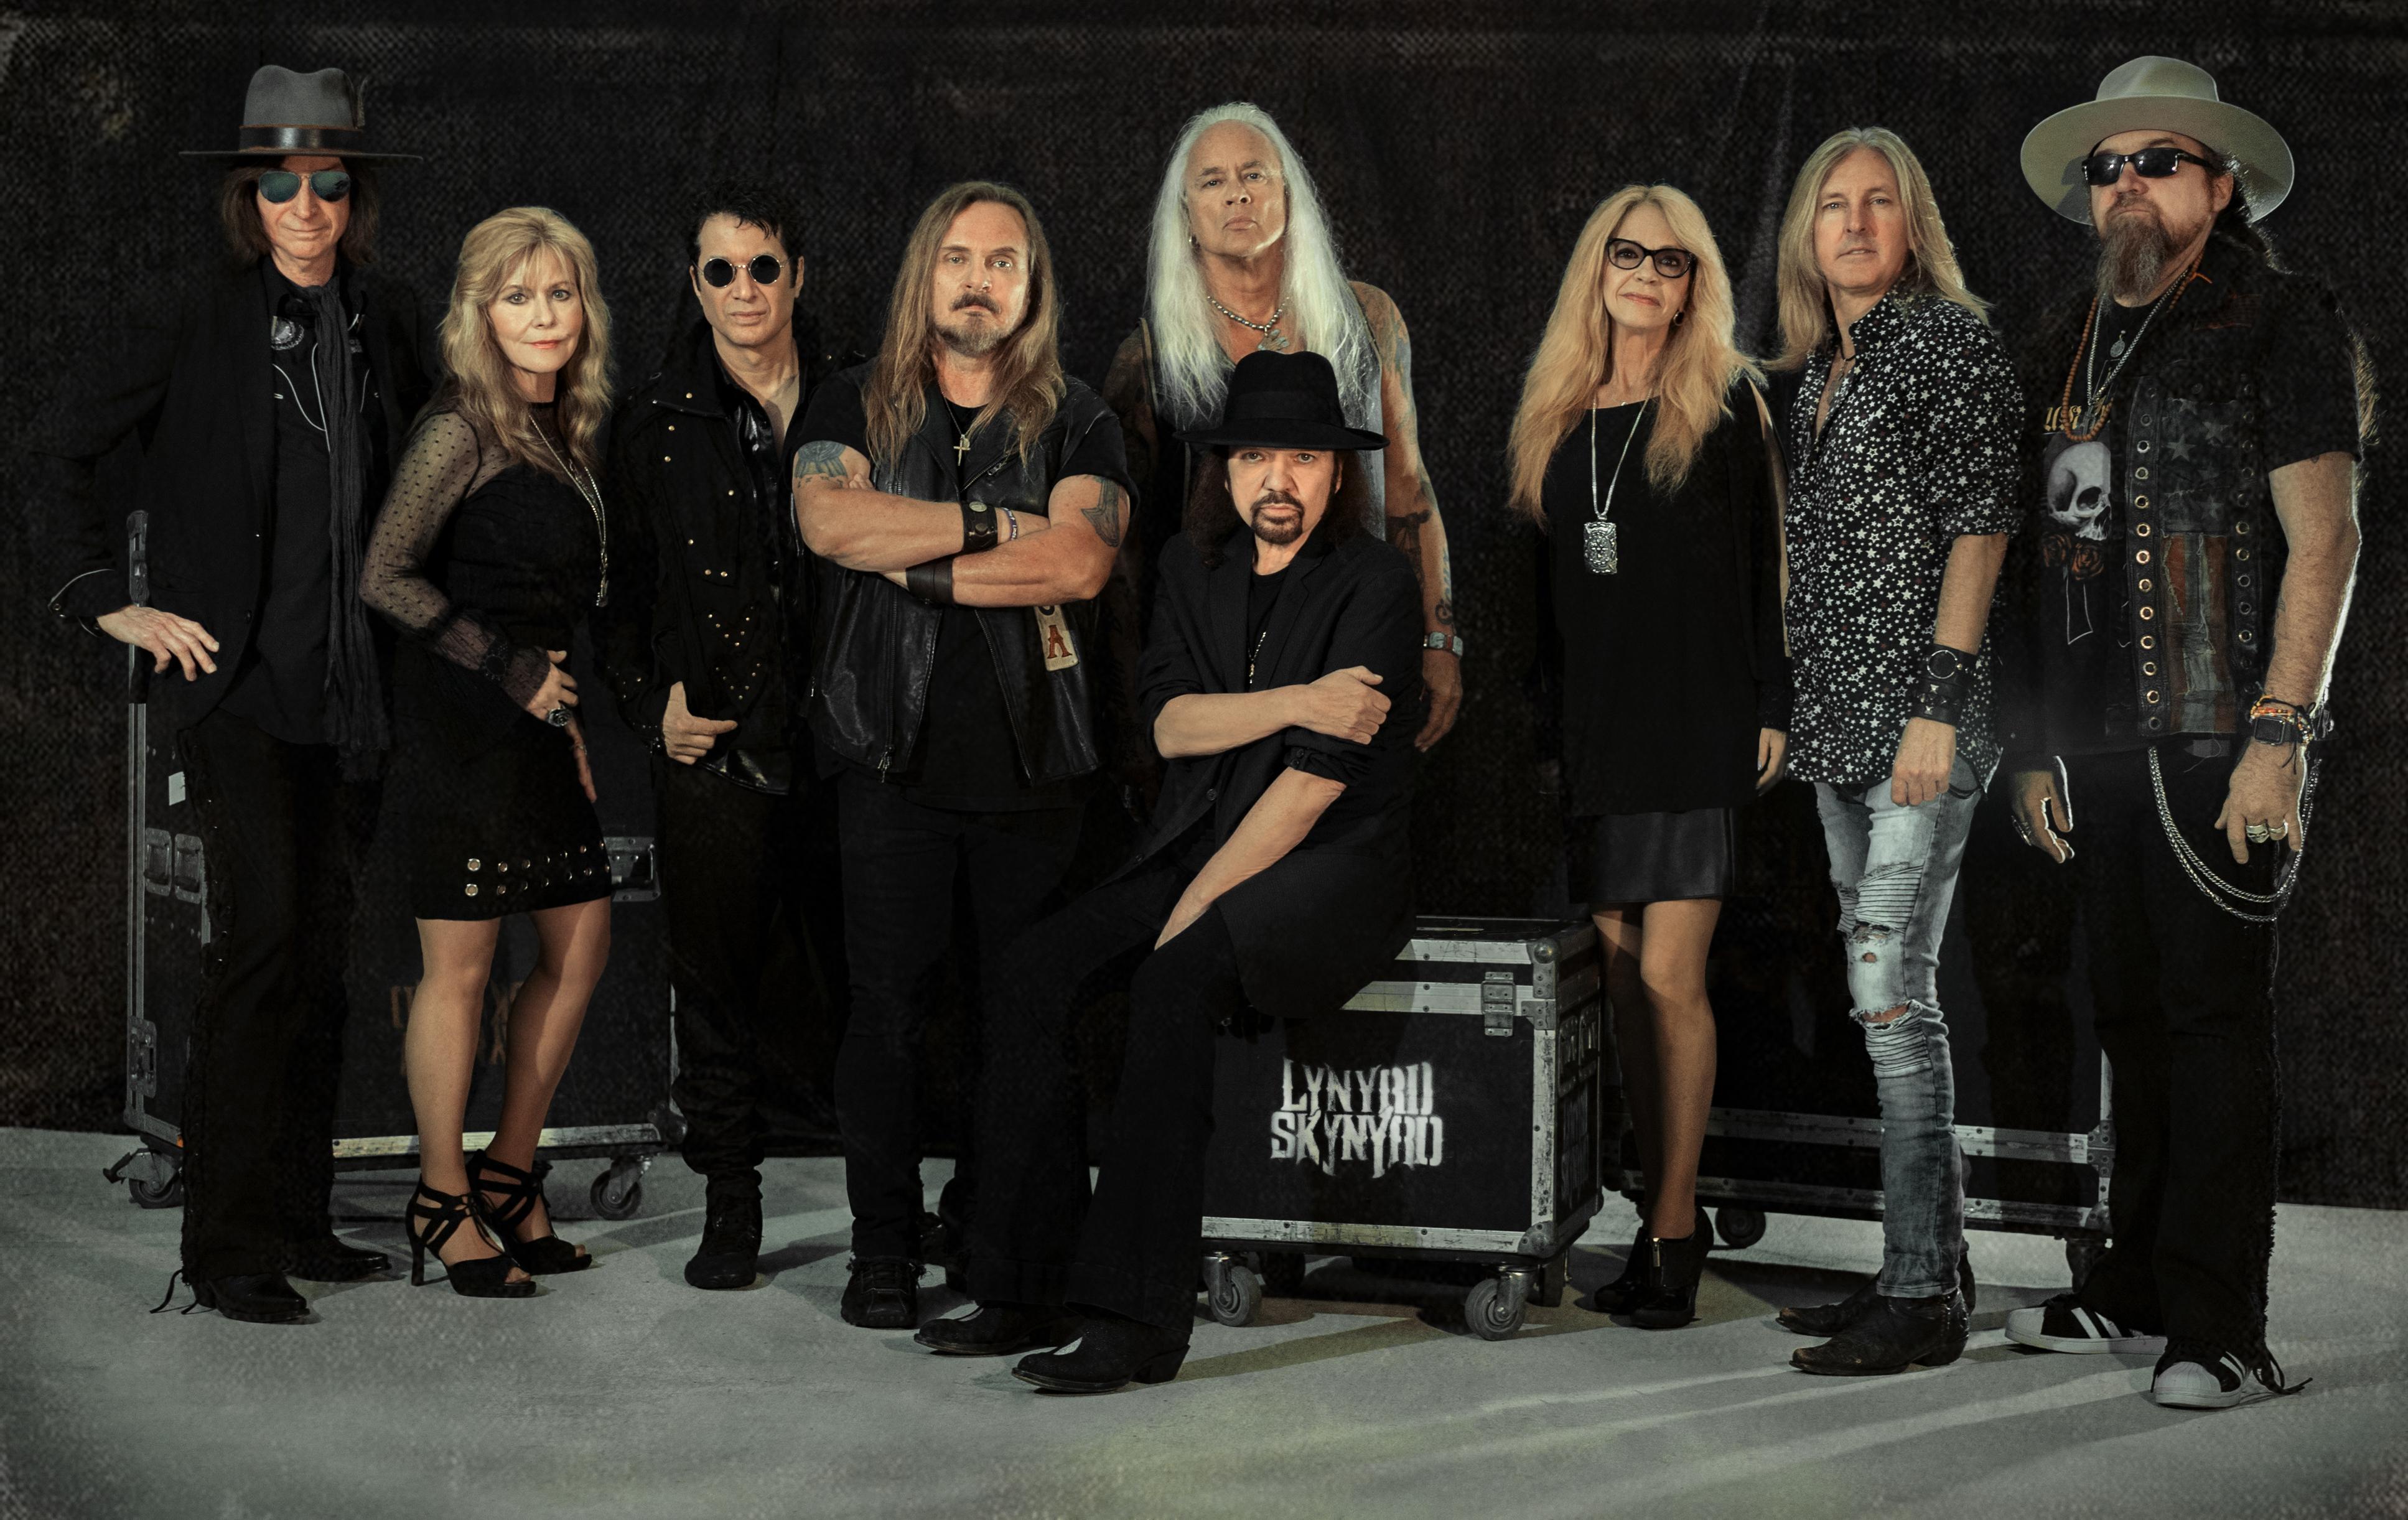 Lynyrd Skynyrd is Coming to Greensboro Coliseum!